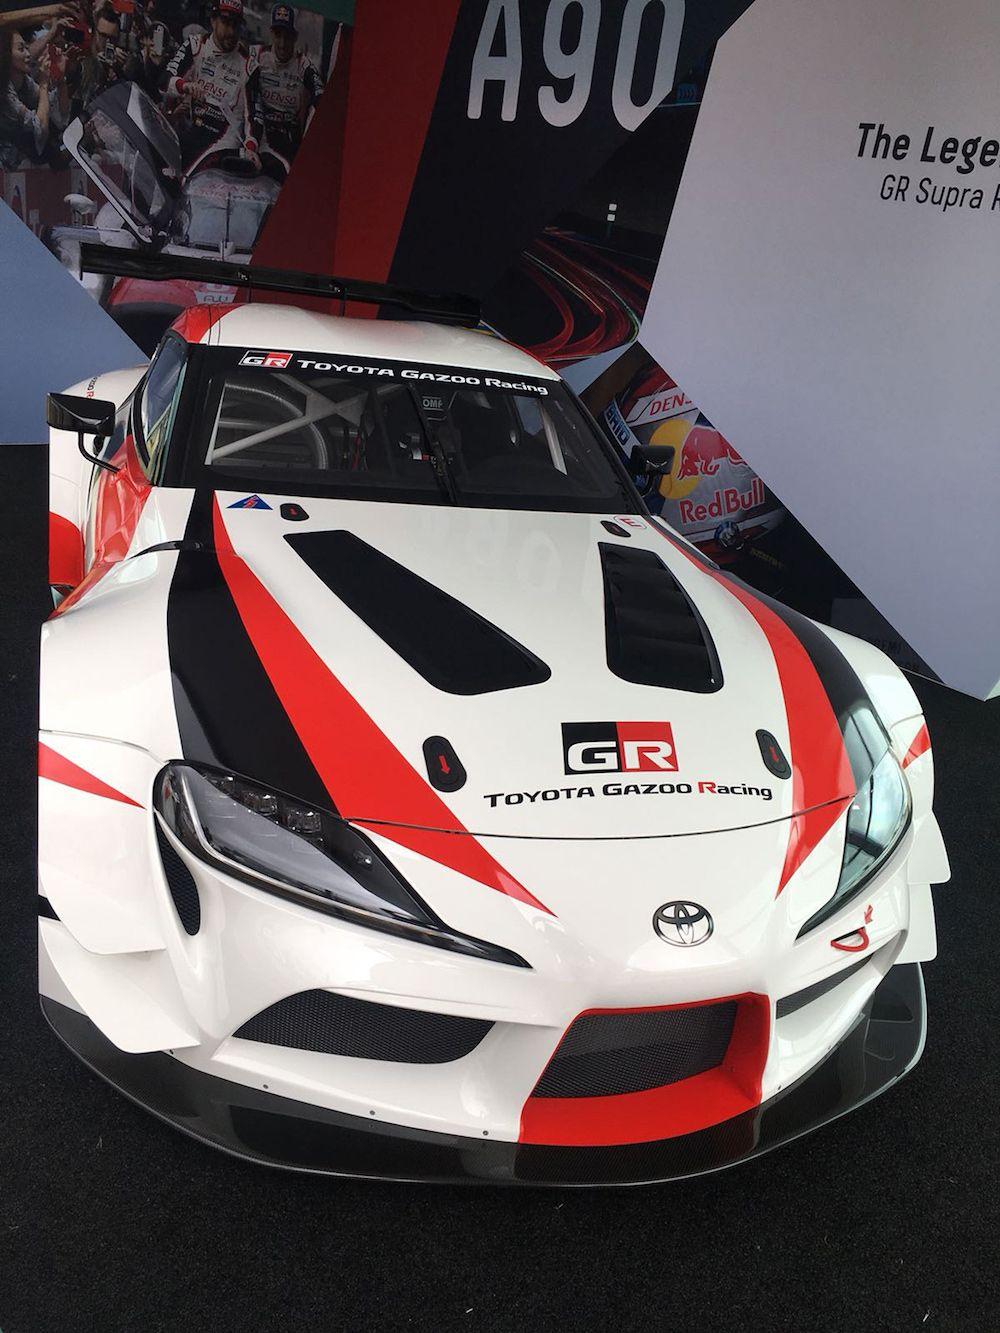 2020 Toyota Supra Fotos Videos Aus Goodwood Addicted To Motorsport Toyota Toyota Supra Marken